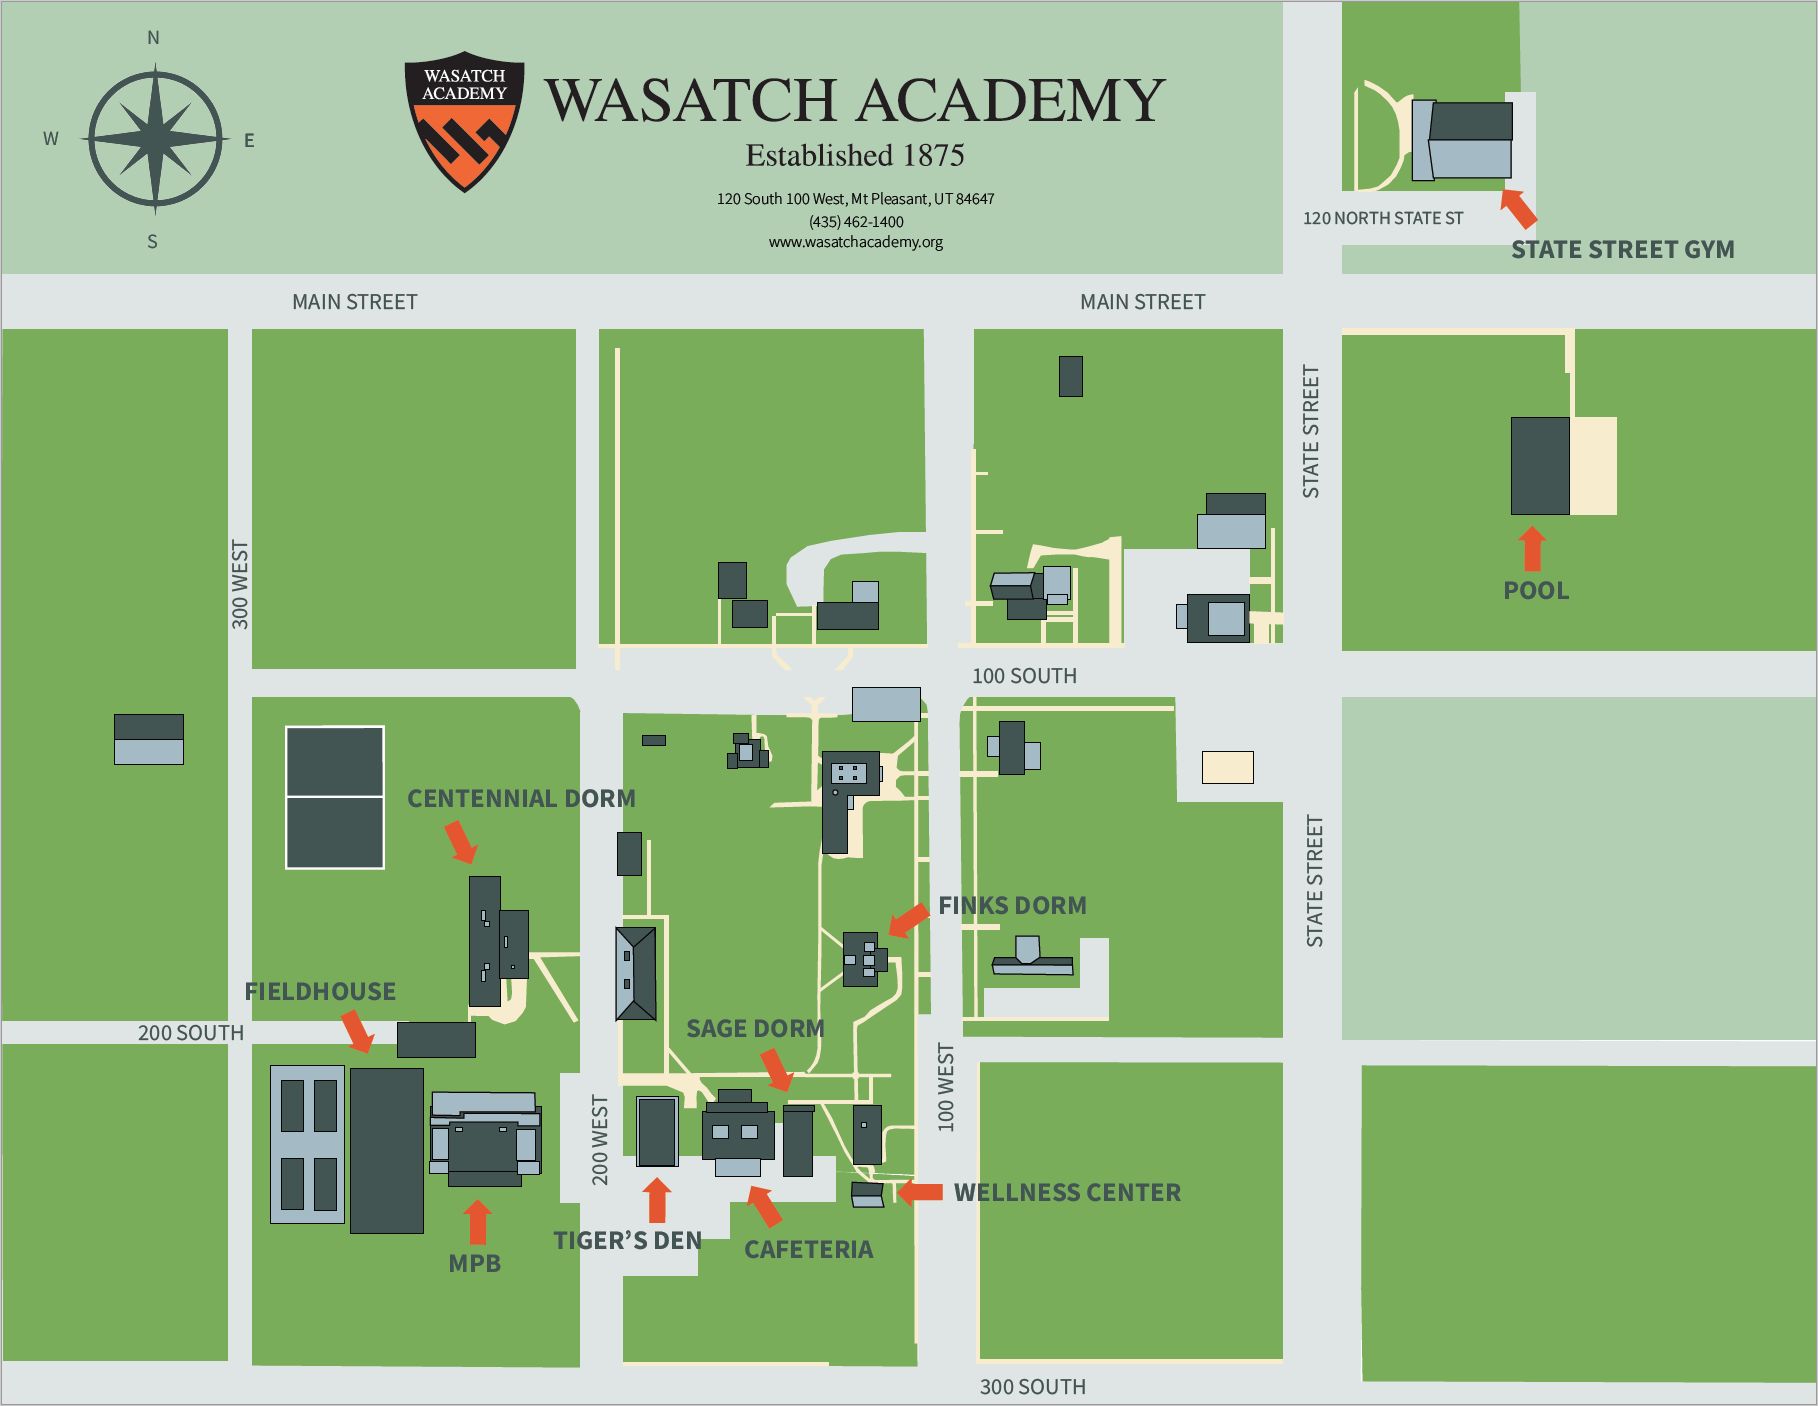 Wasatch Academy Basketball Camp Map